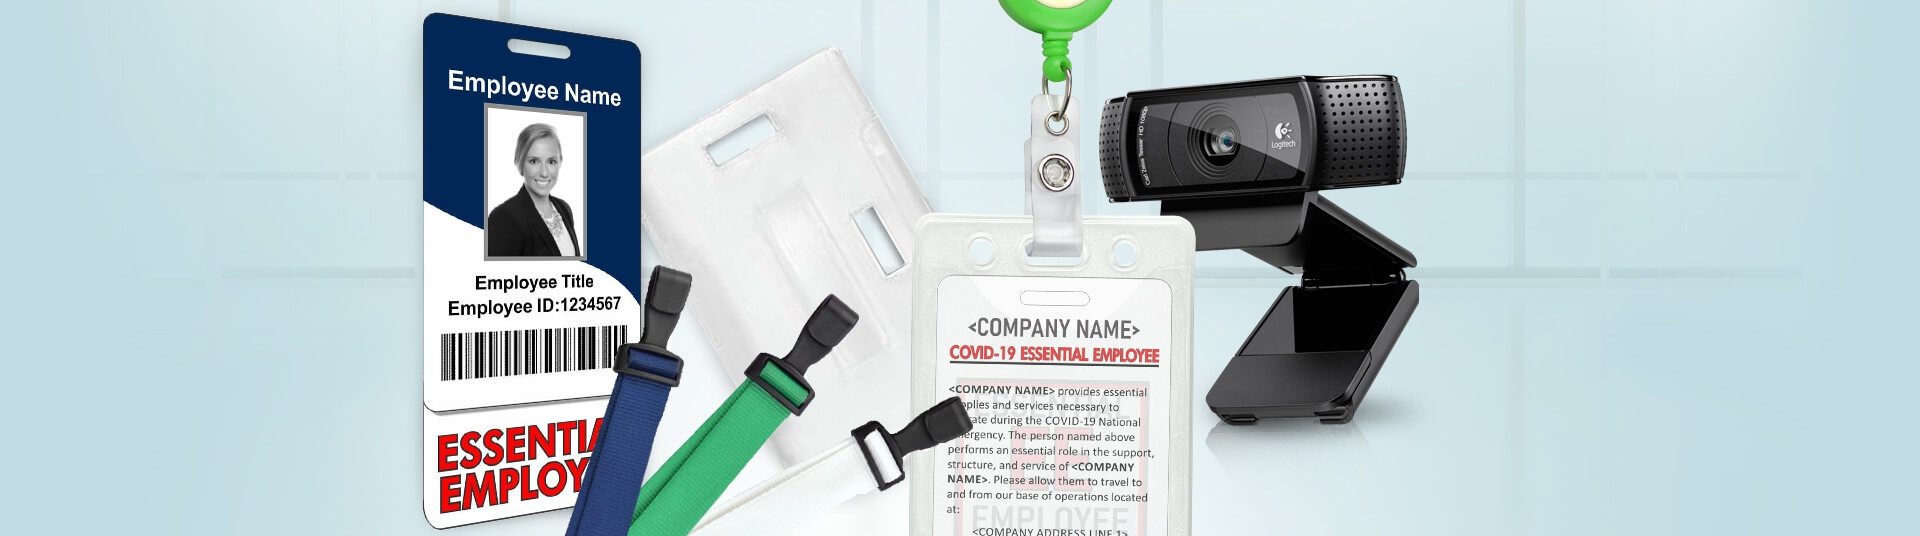 COVID-19 Emergency Response Supplies